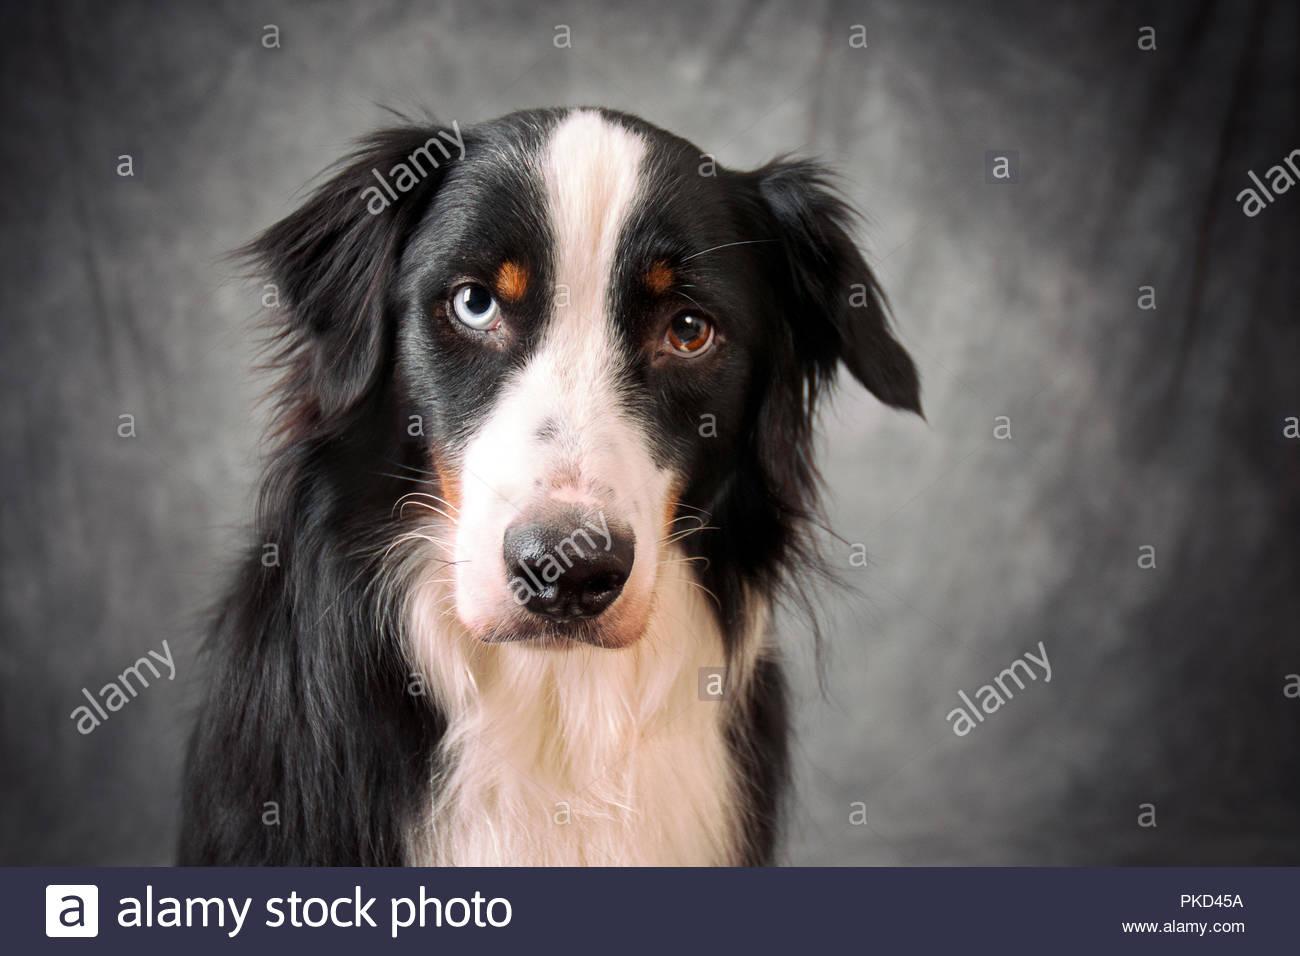 portrait of black tri australian shepherd with one blue eye and one brown eye on gray swirled backdrop - Stock Image